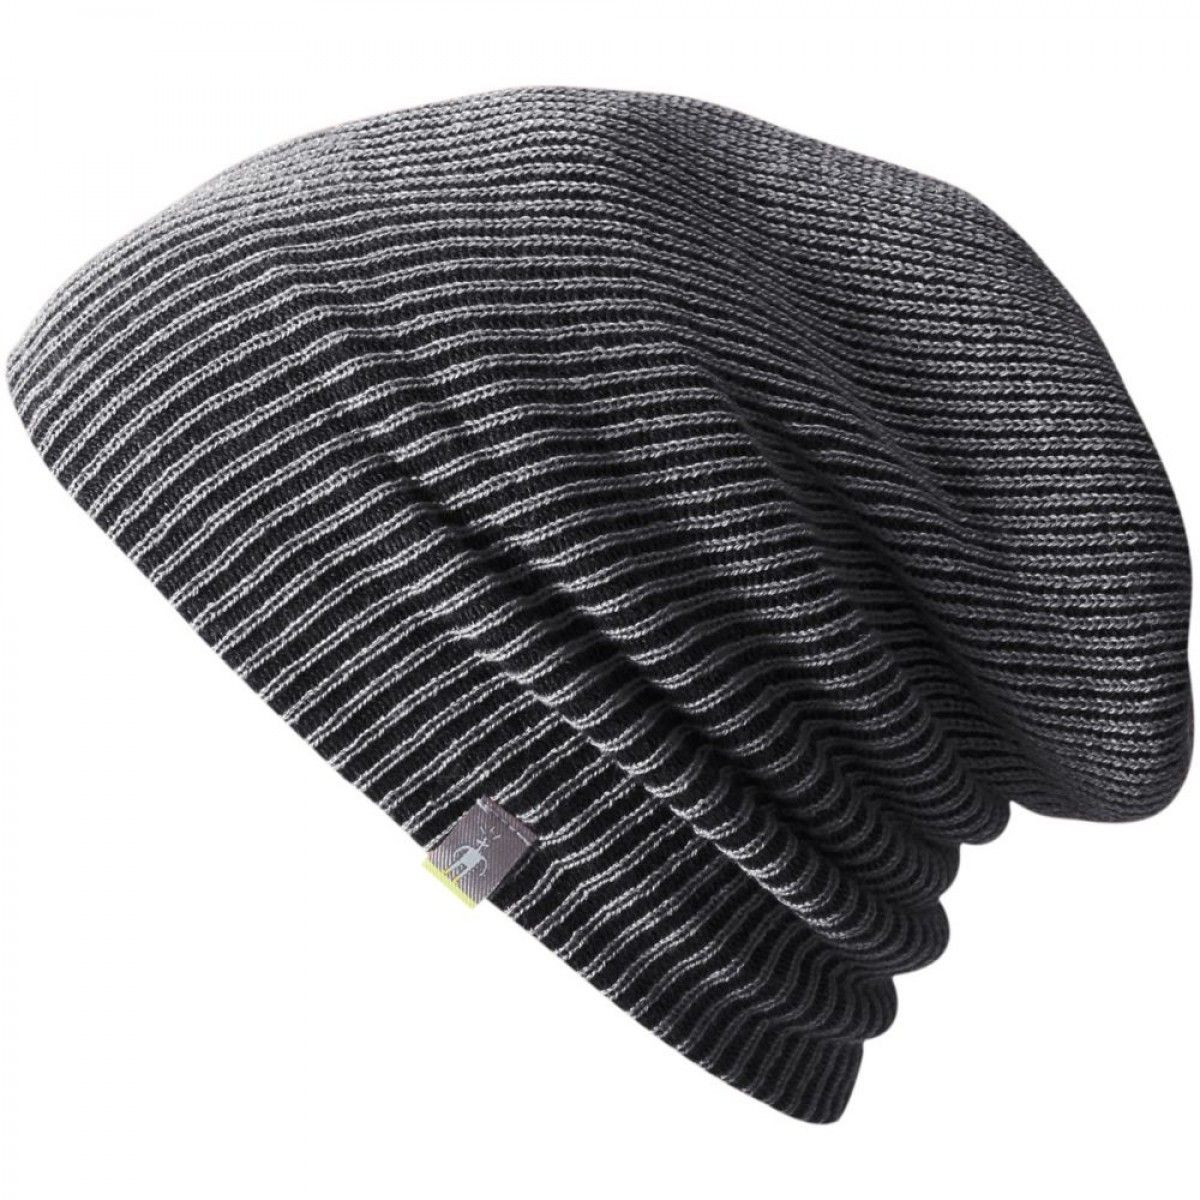 43437ded5 SmartWool Men's Reversible Slouch Beanie | SmartWool Fall/Winter ...